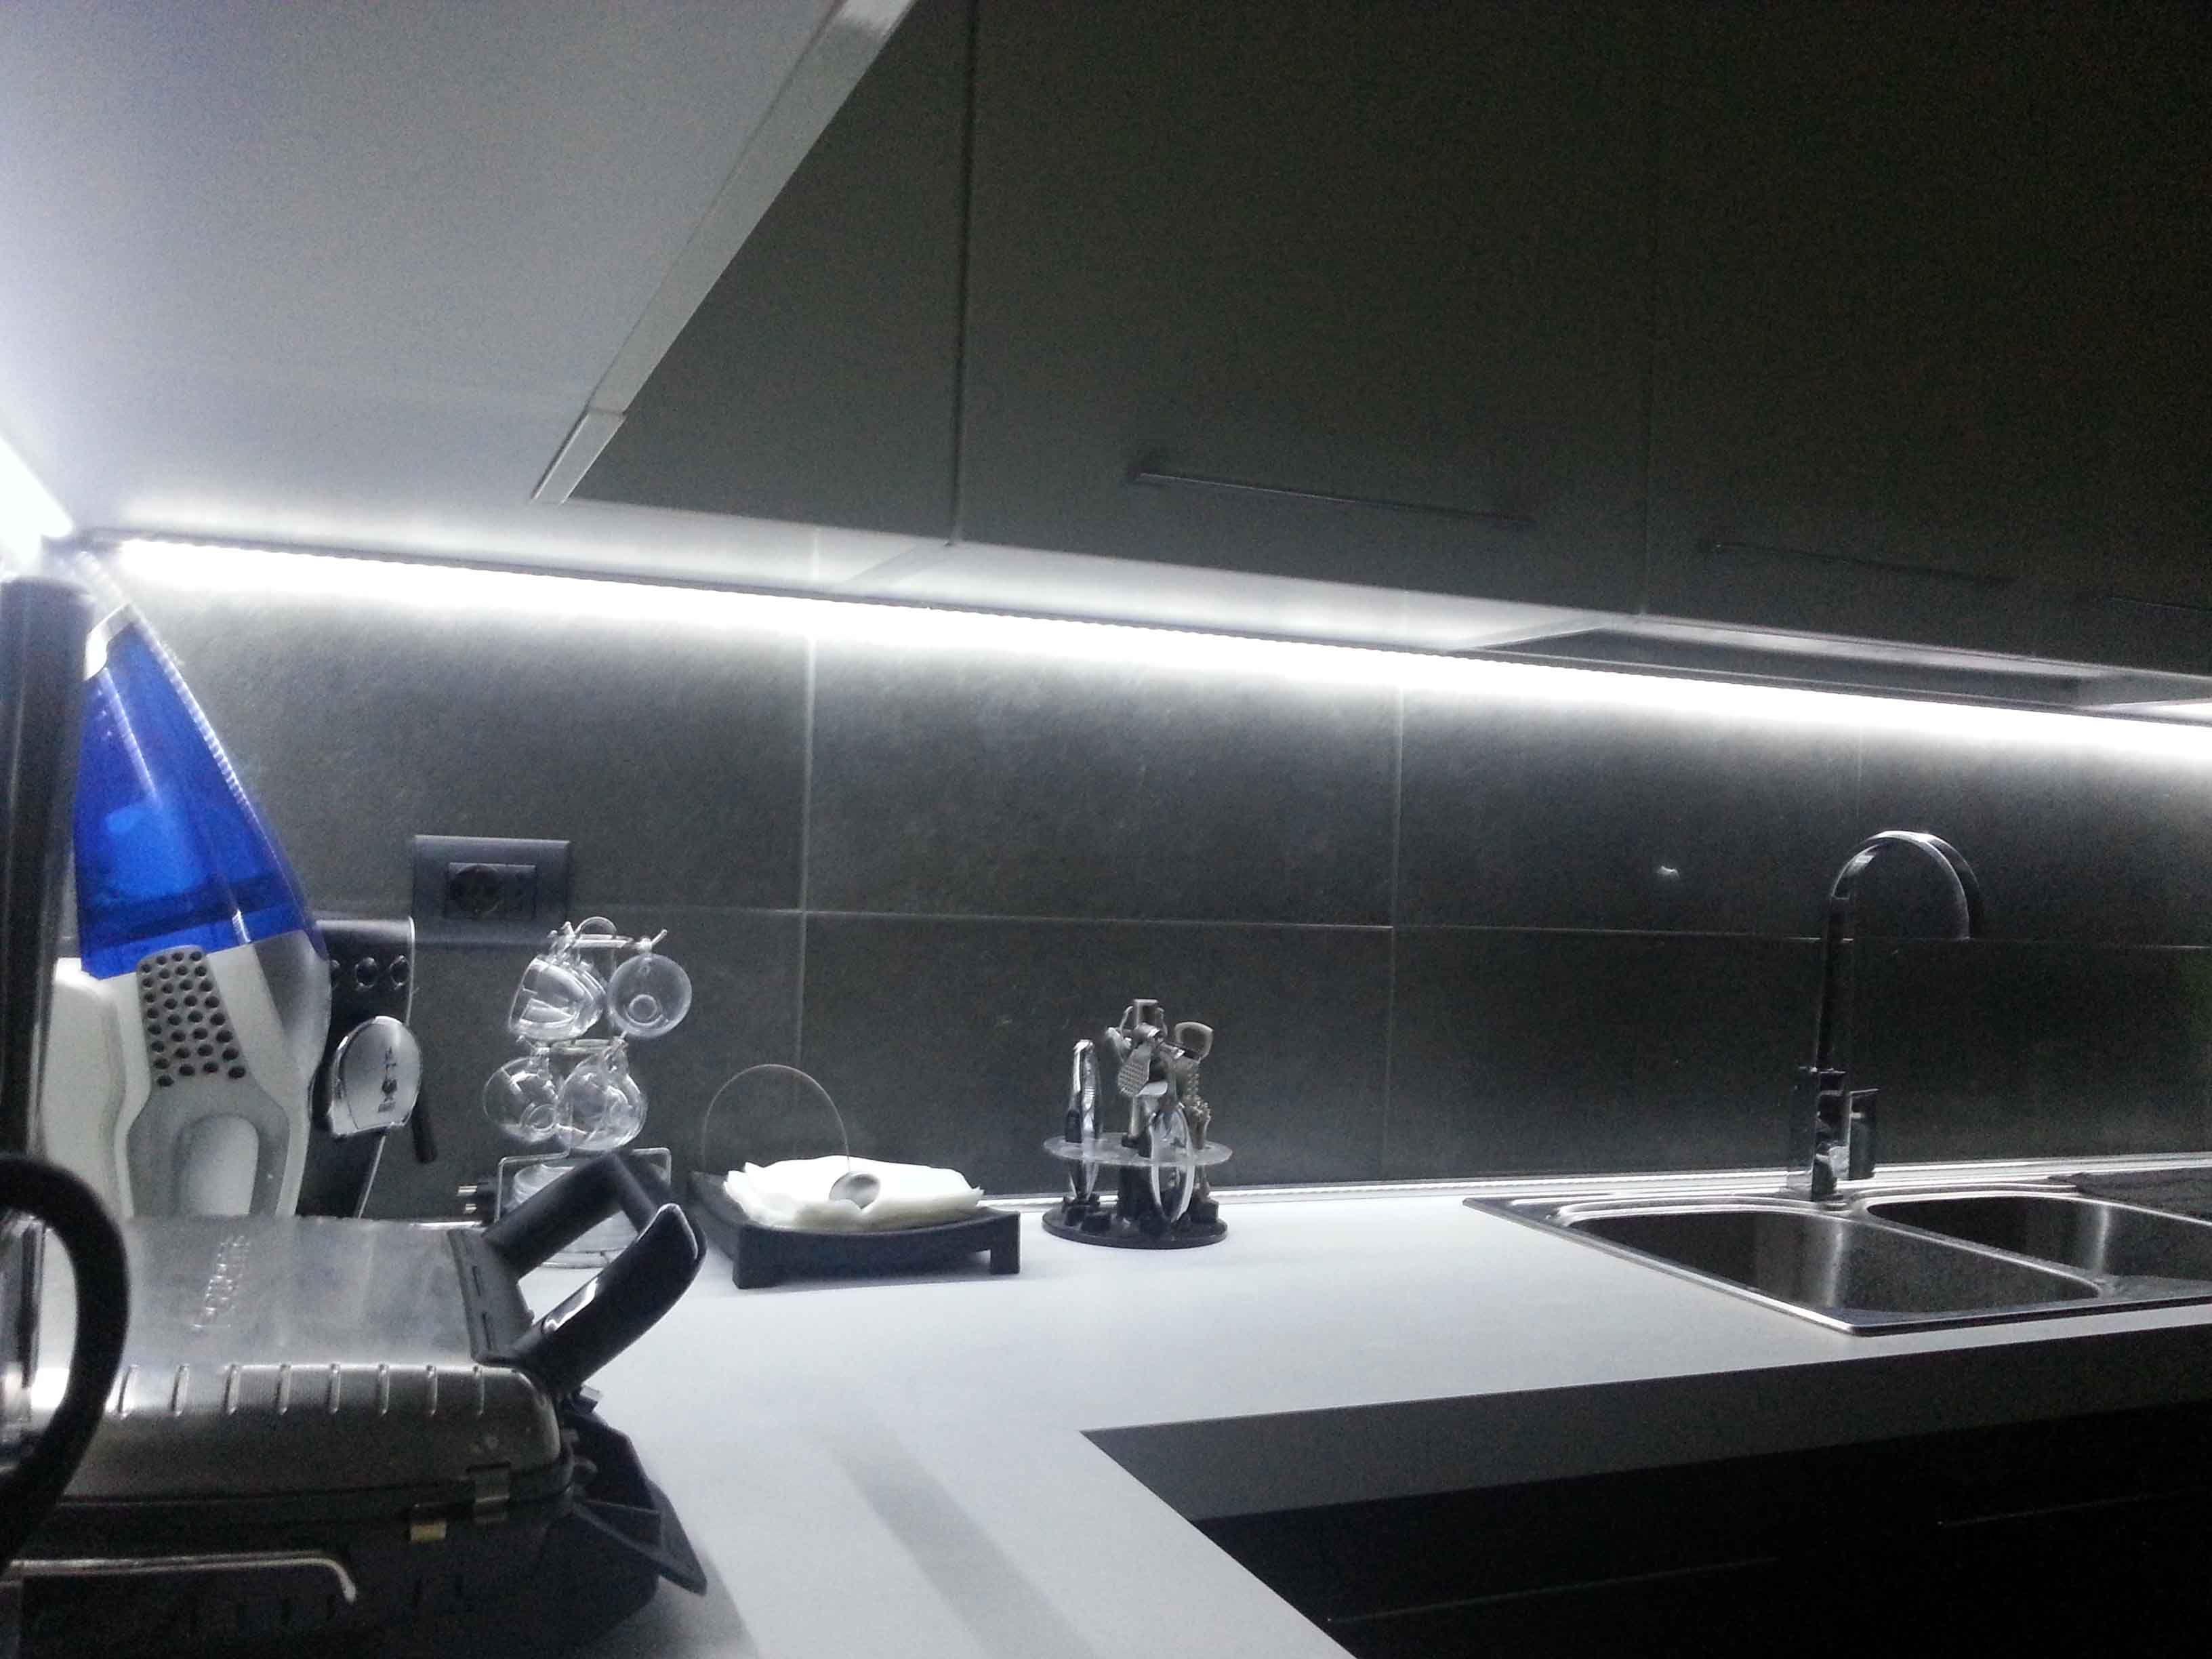 Il piano di una cucina illuminato da una striscia led bianca strisce led pinterest - Striscia led cucina ...